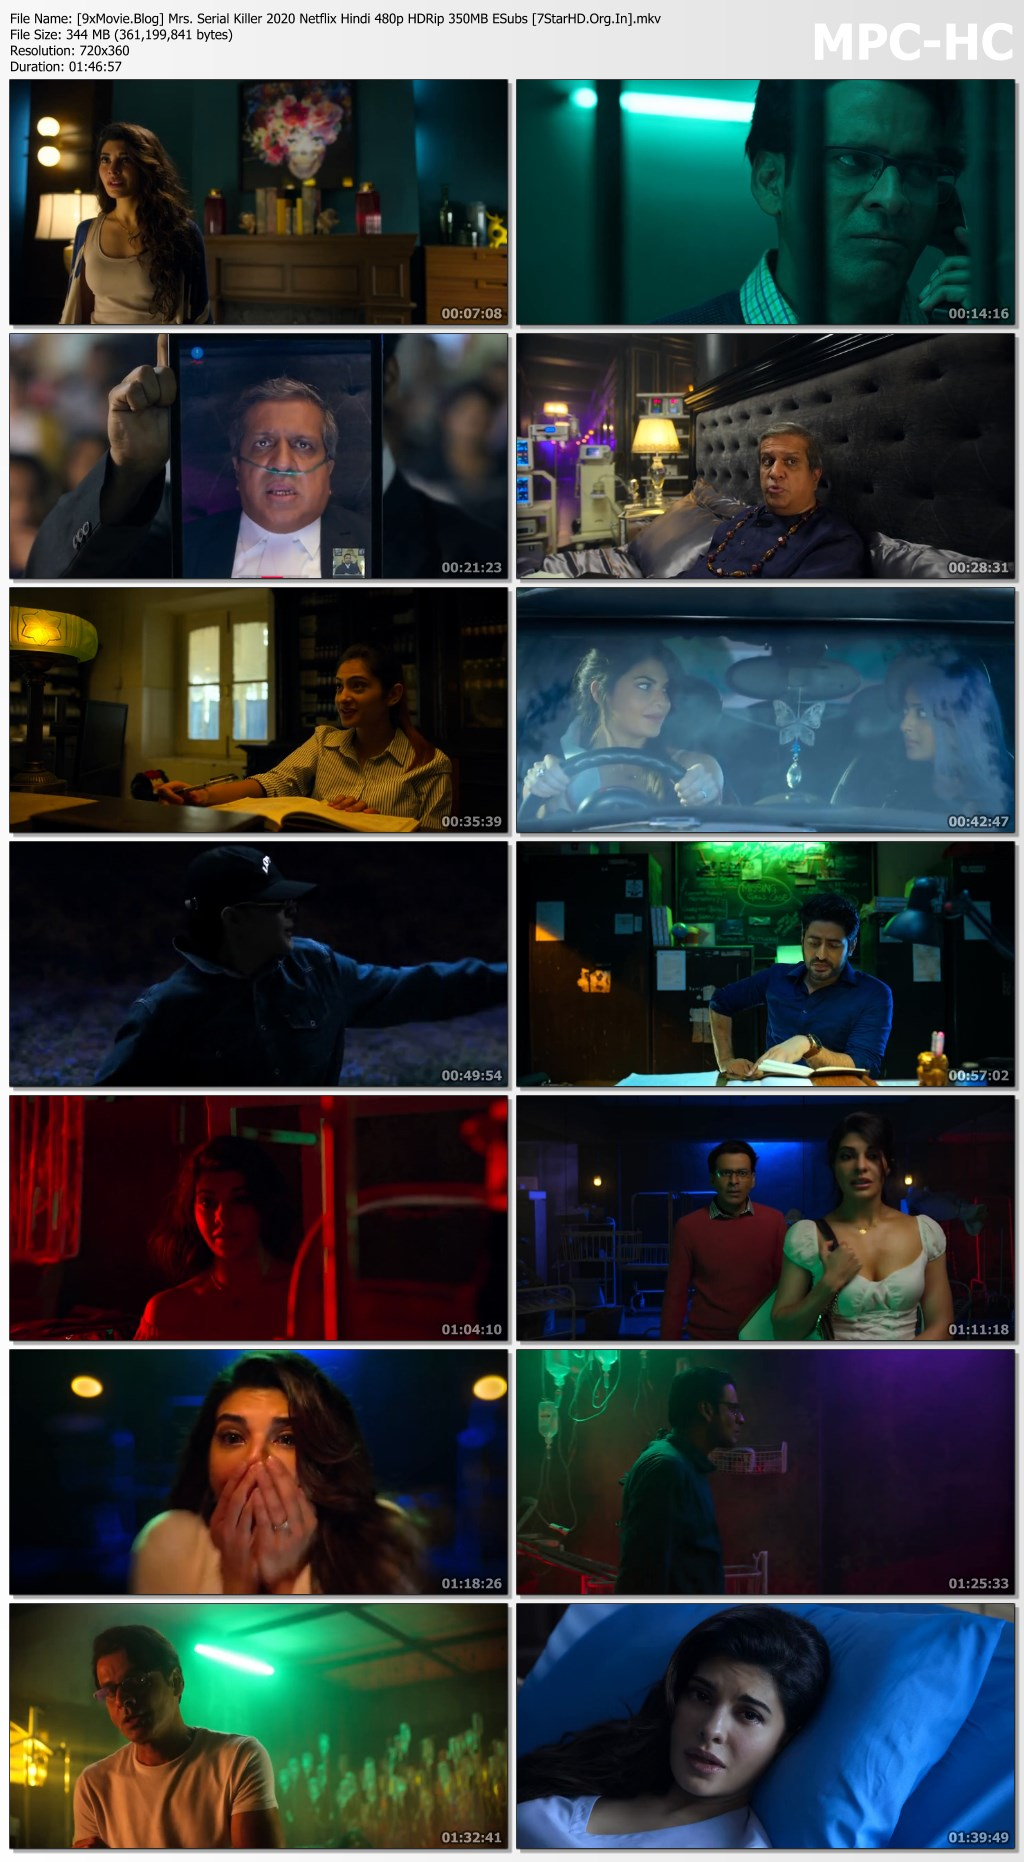 Mrs. Serial Killer 2020 Netflix Hindi 480p HDRip x264 350MB ESubs